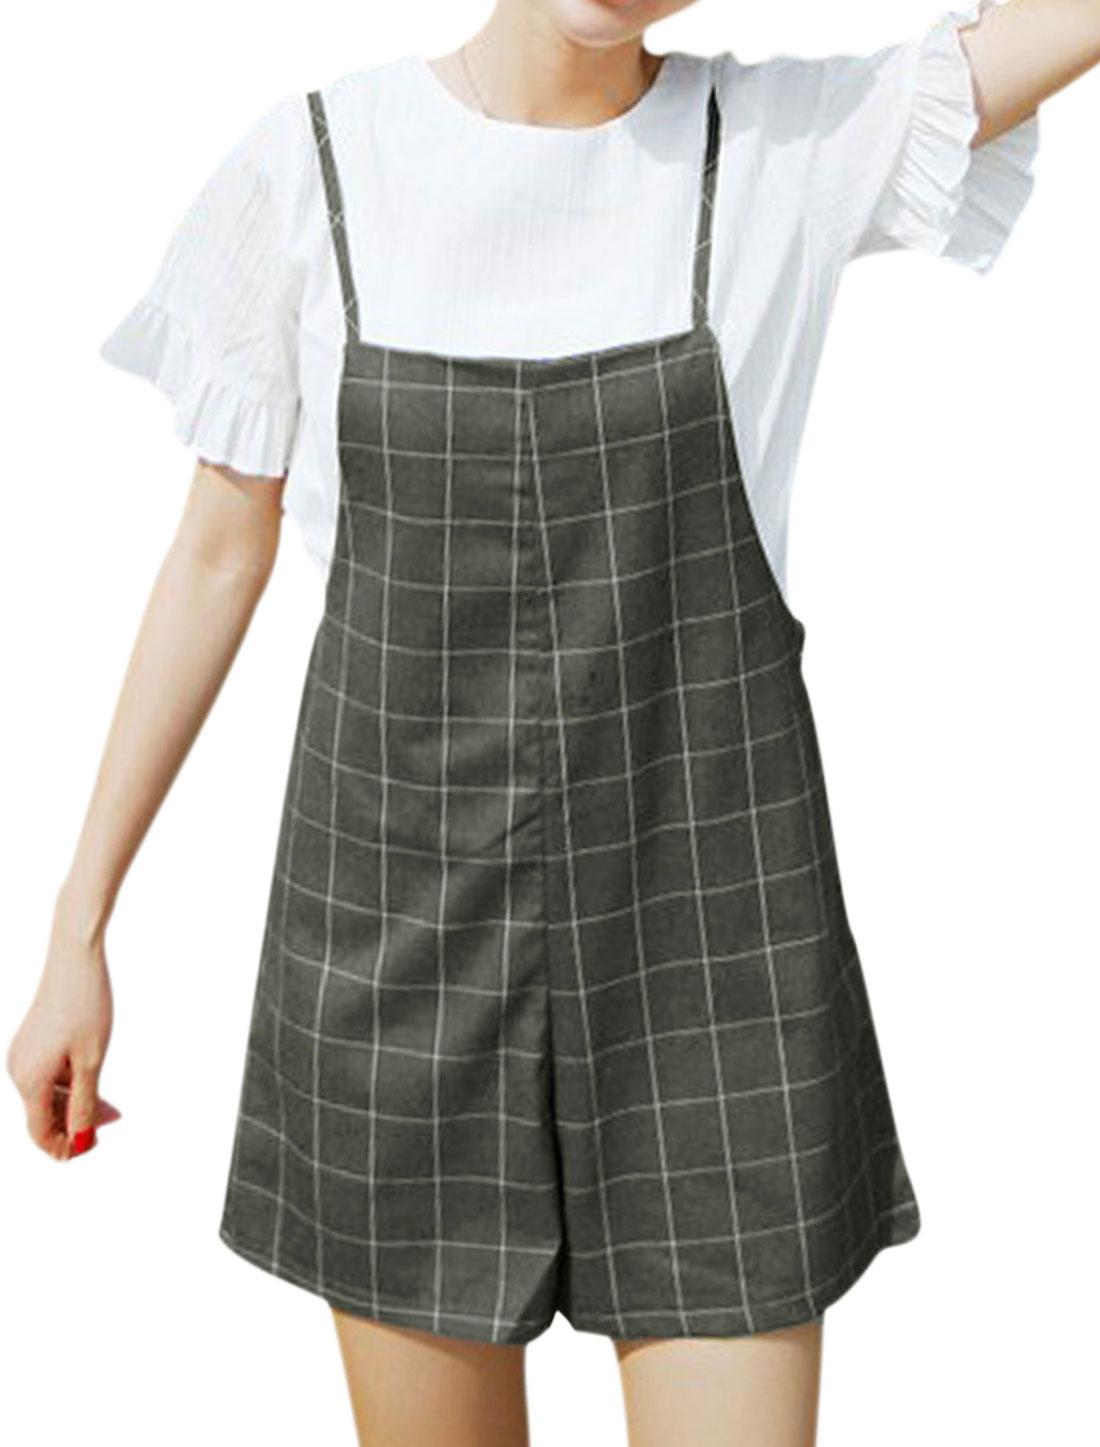 Women Plaids Straight Casual Suspender Shorts Dark Gray S